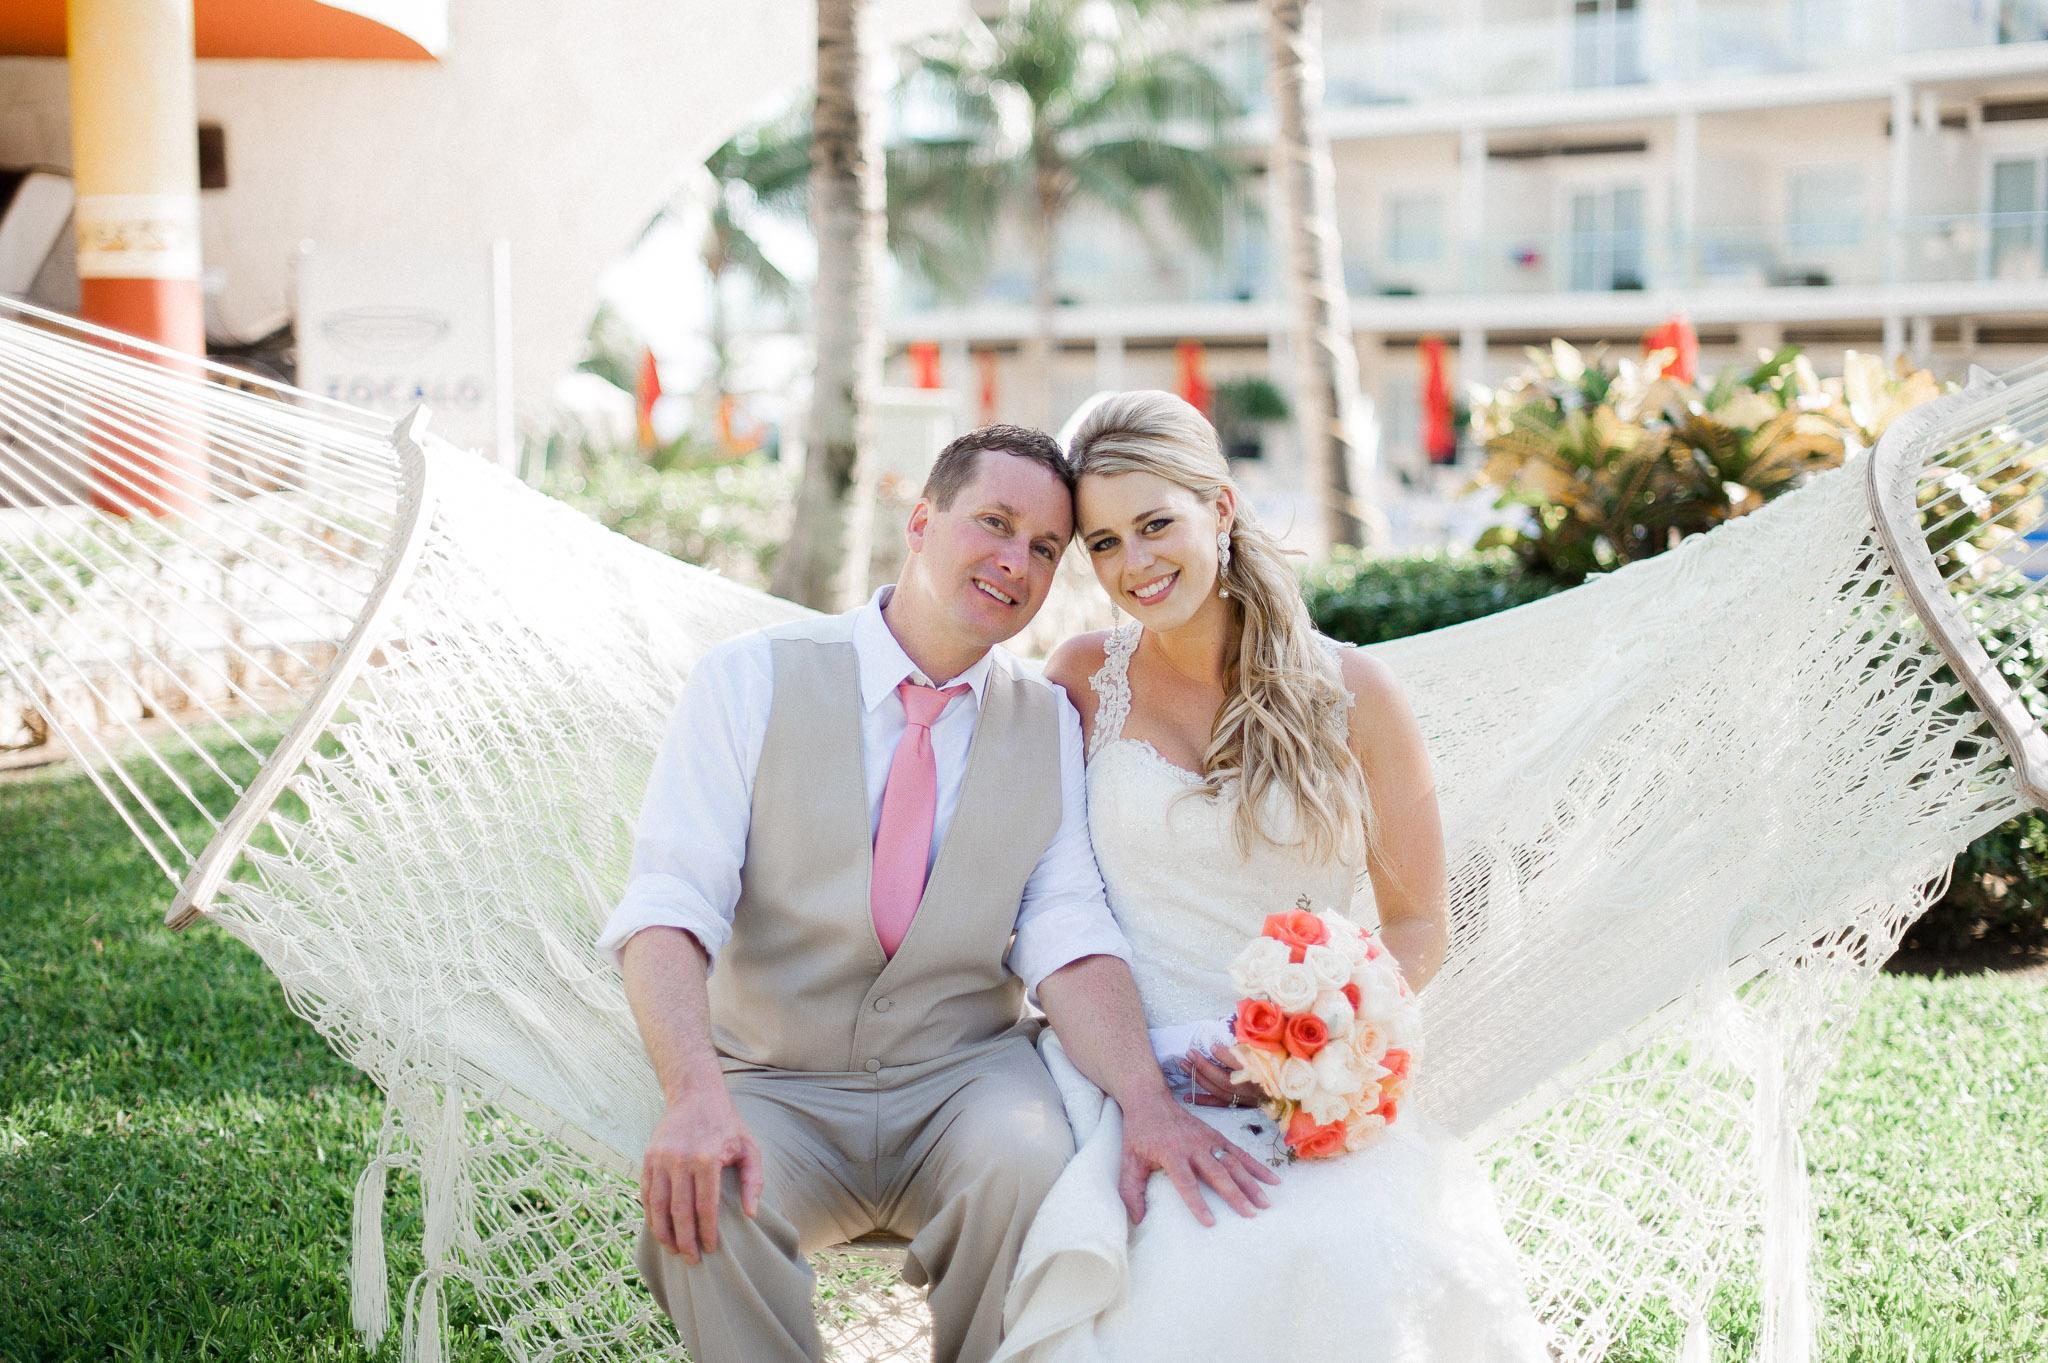 Megan and Chris wedding-37.jpg